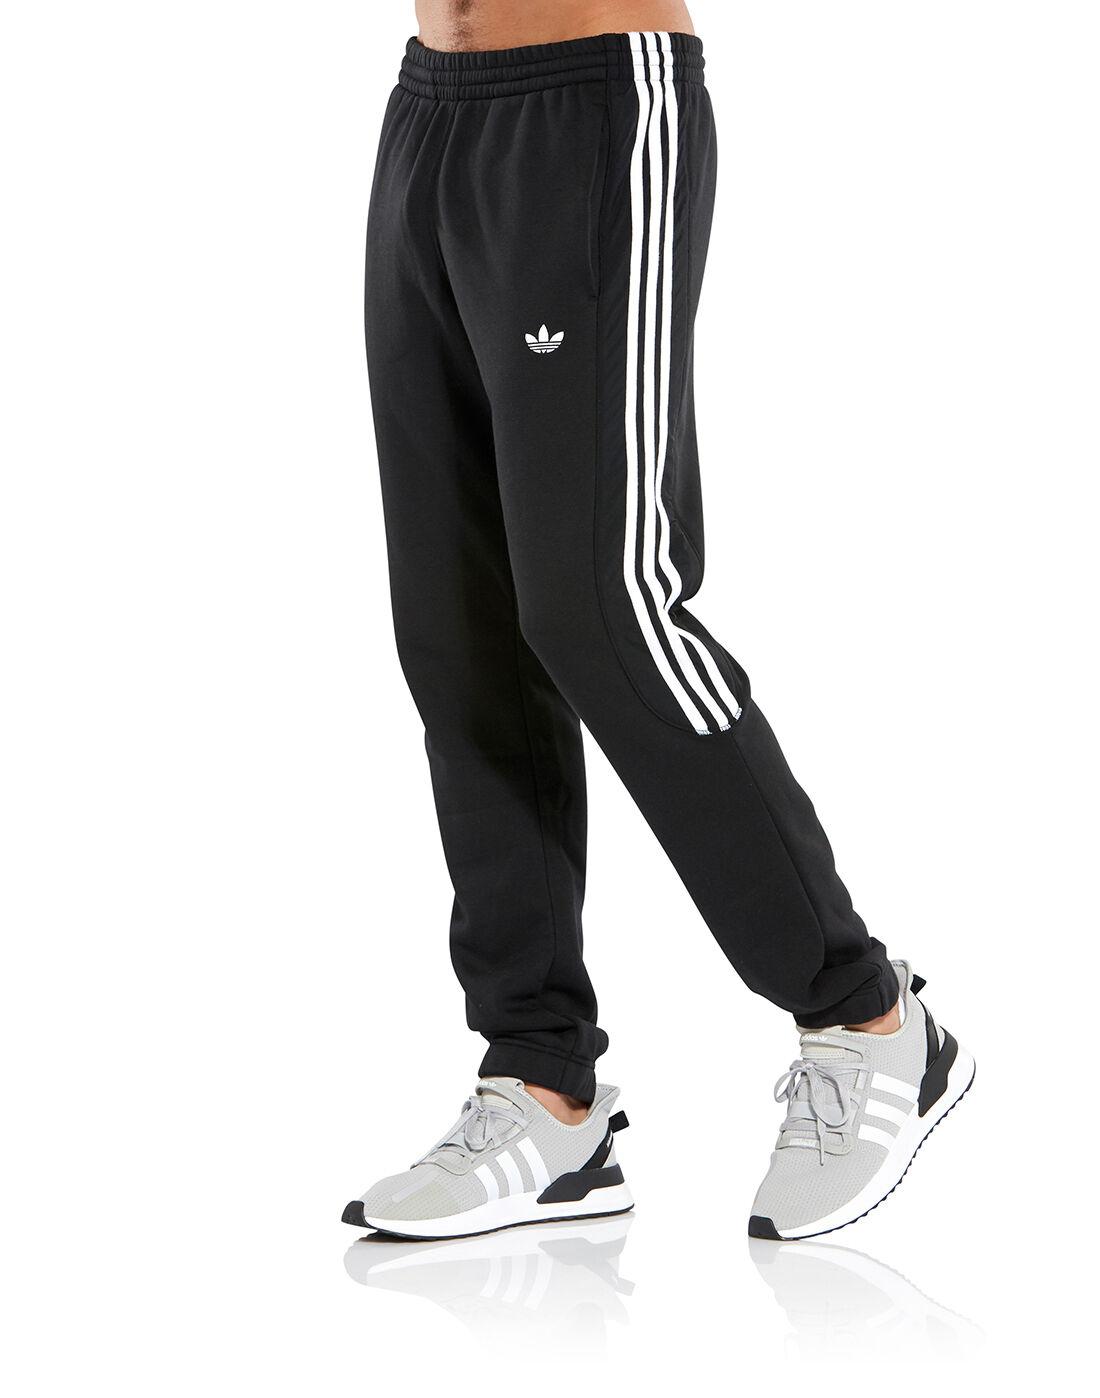 Men's Black adidas Originals Radkin Pants   Life Style Sports